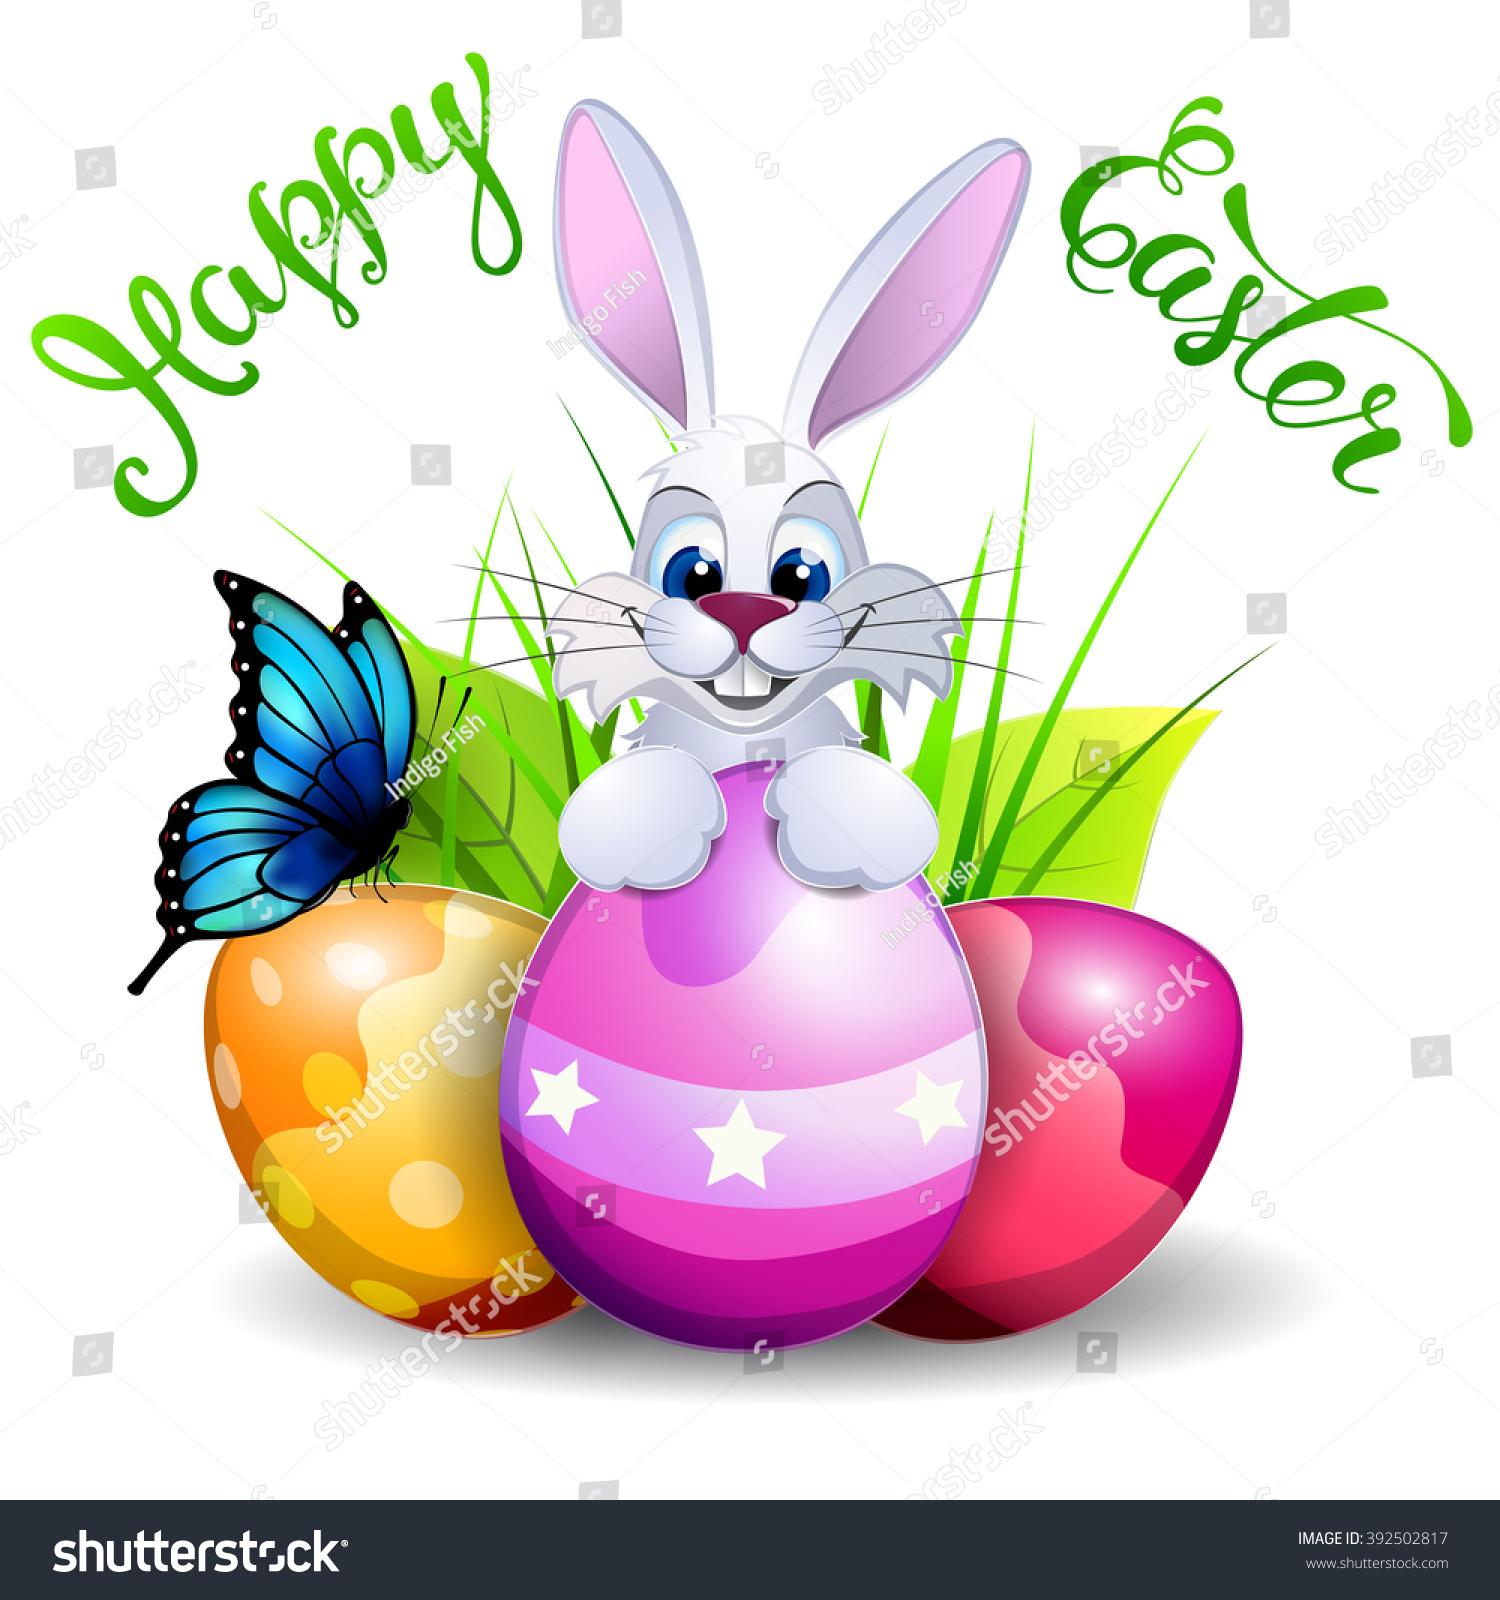 Easter Greeting Card Easter Symbols Handwritten Stock Vector